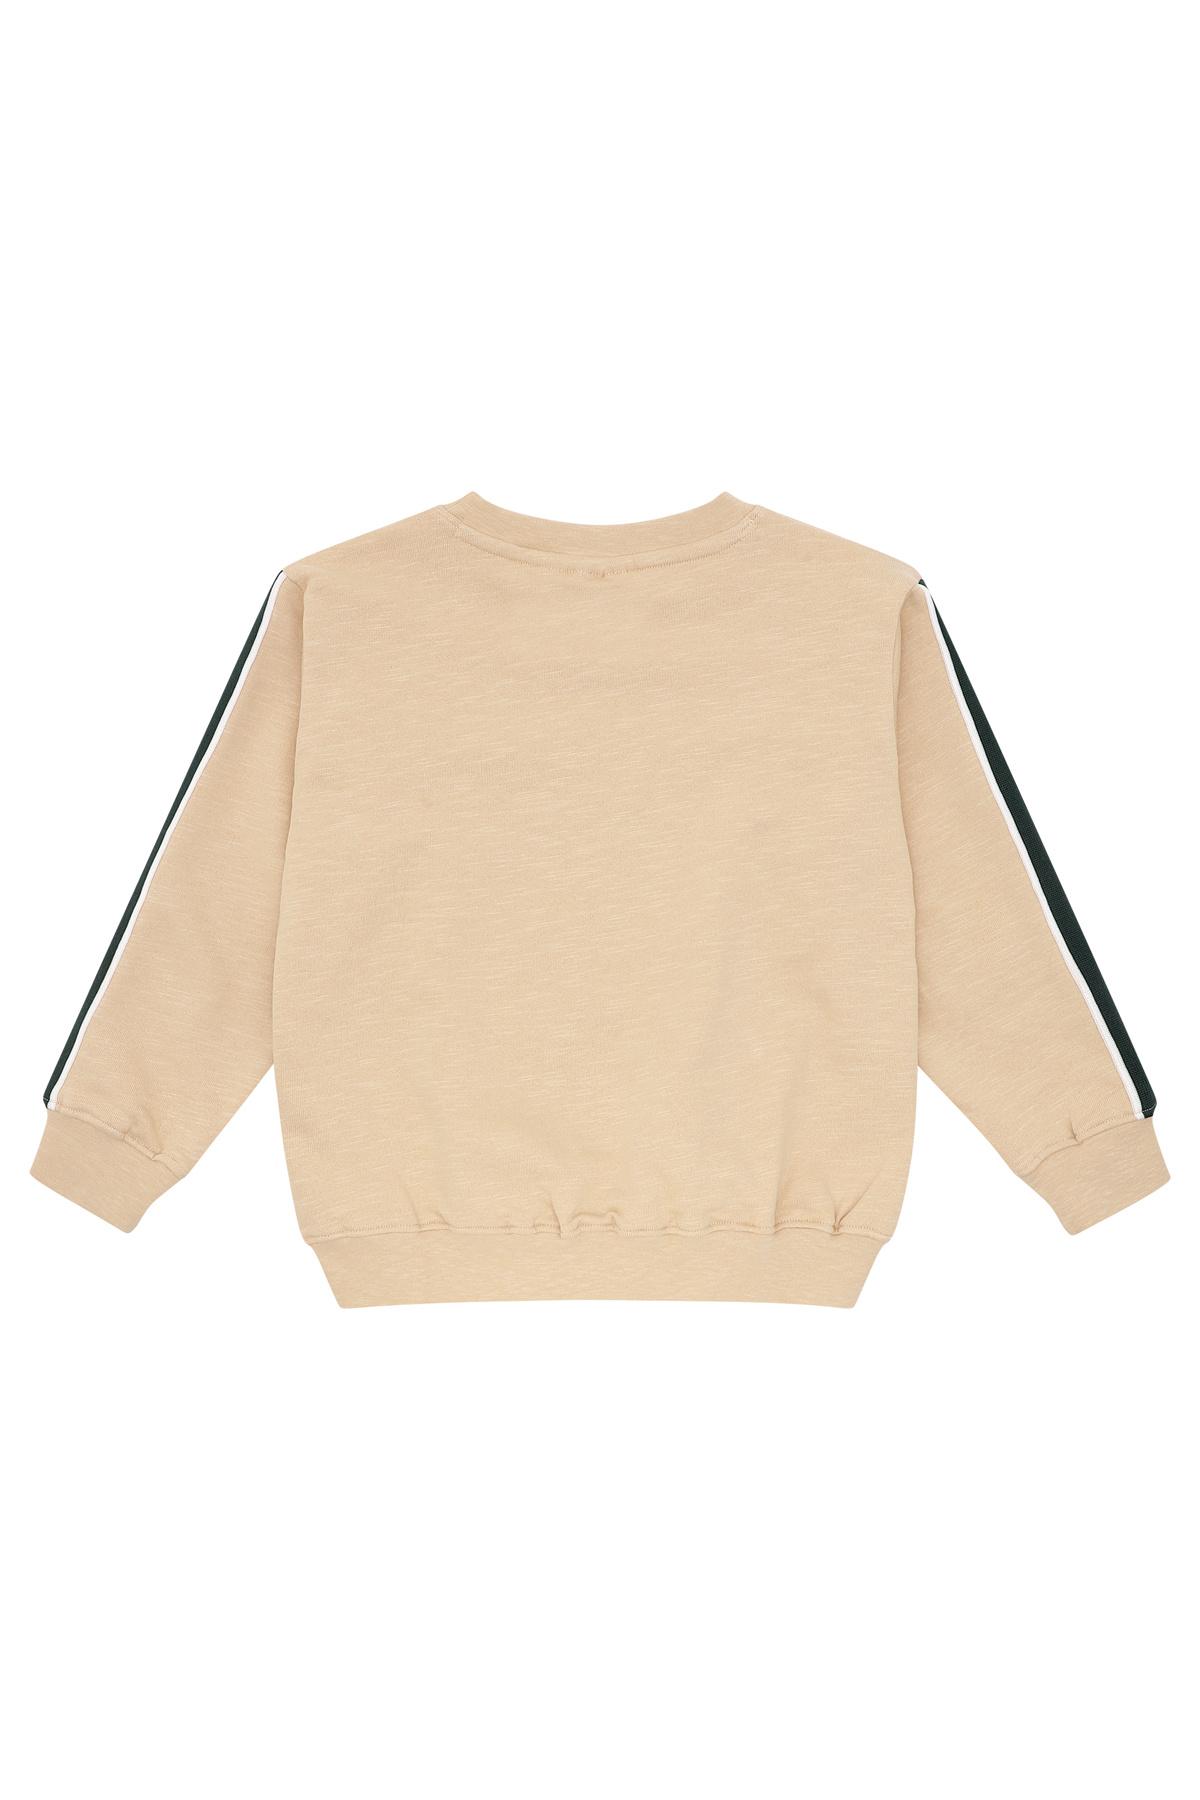 Baptiste sweatshirt - Beige-2